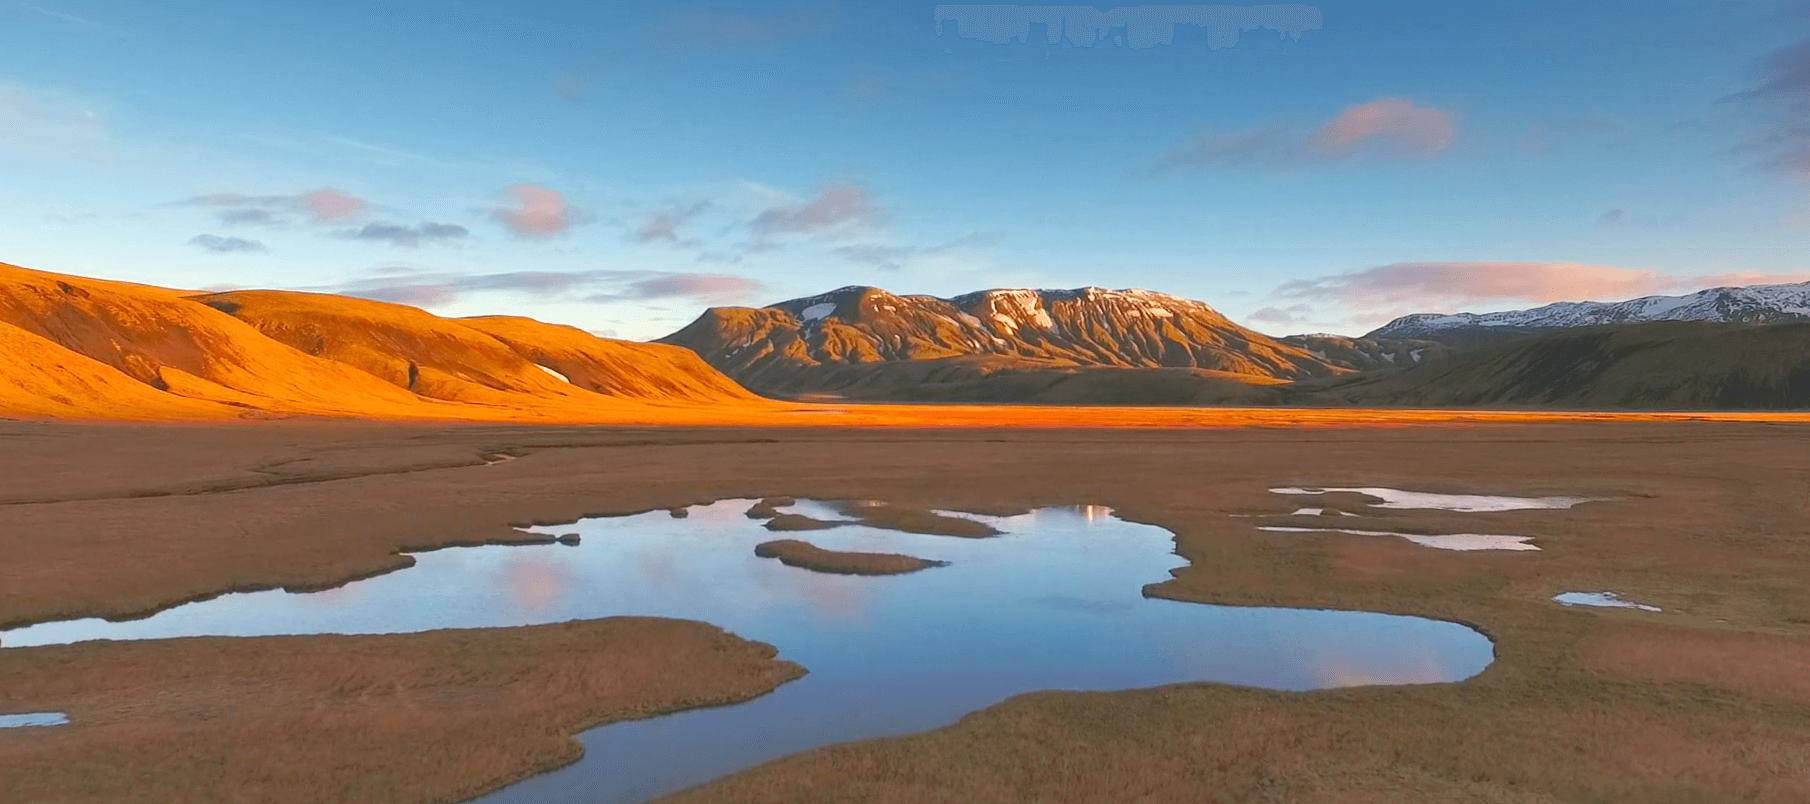 Flying over Iceland (Part. II)